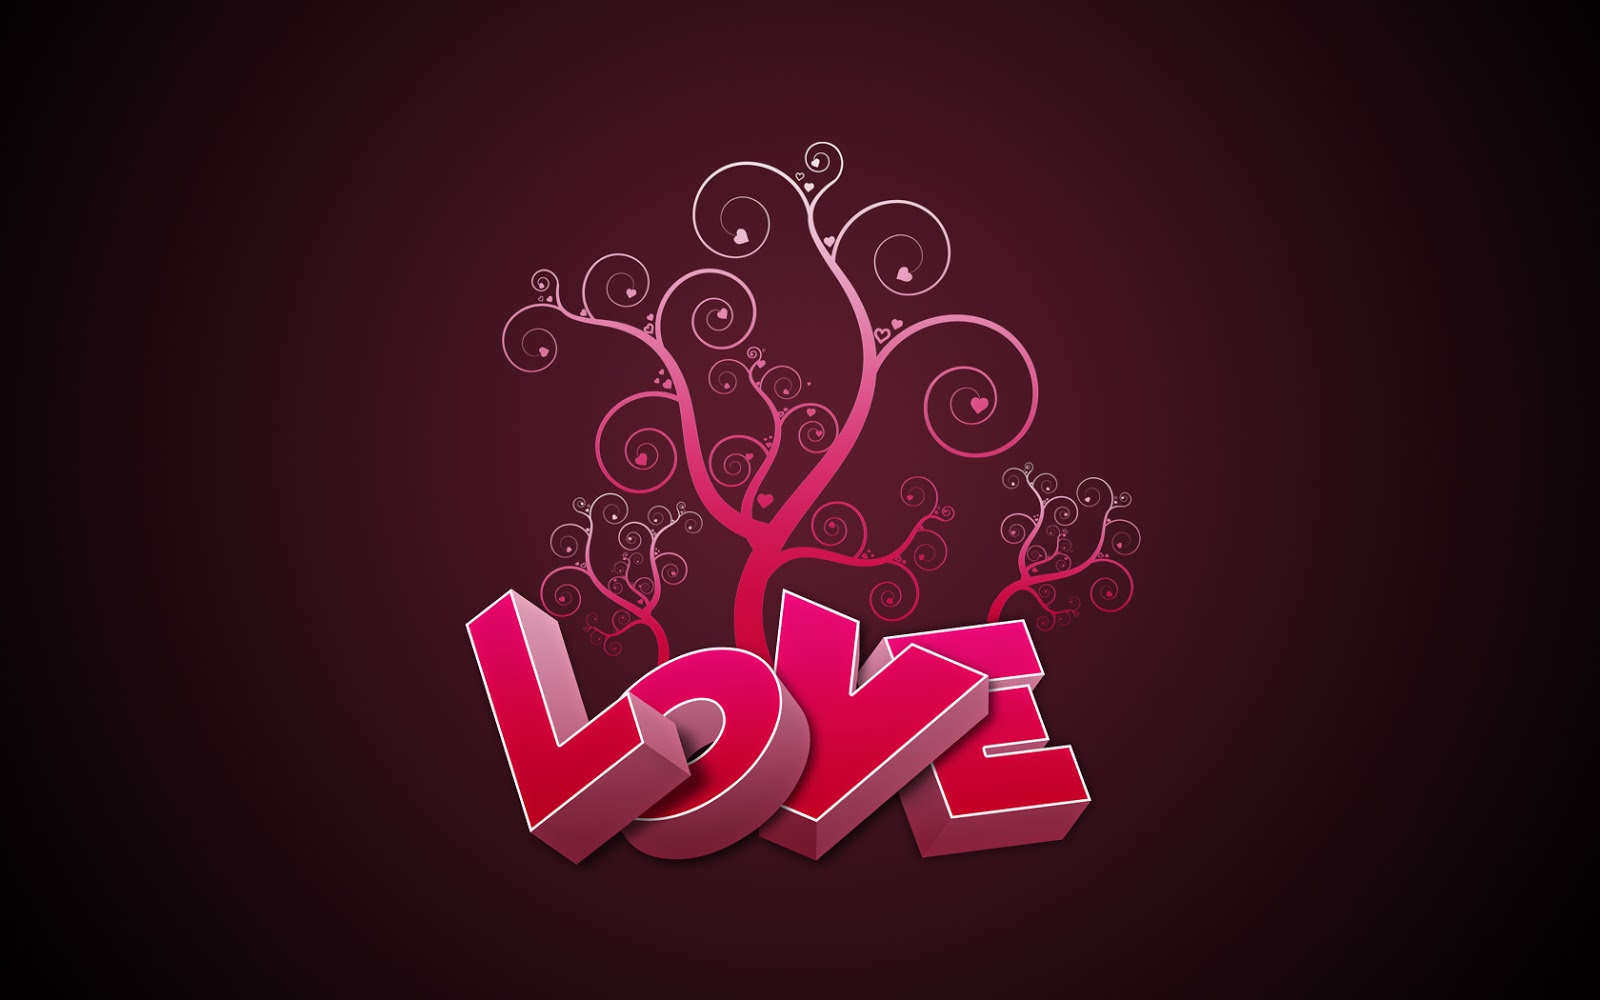 desktop 1080p hd love - photo #10